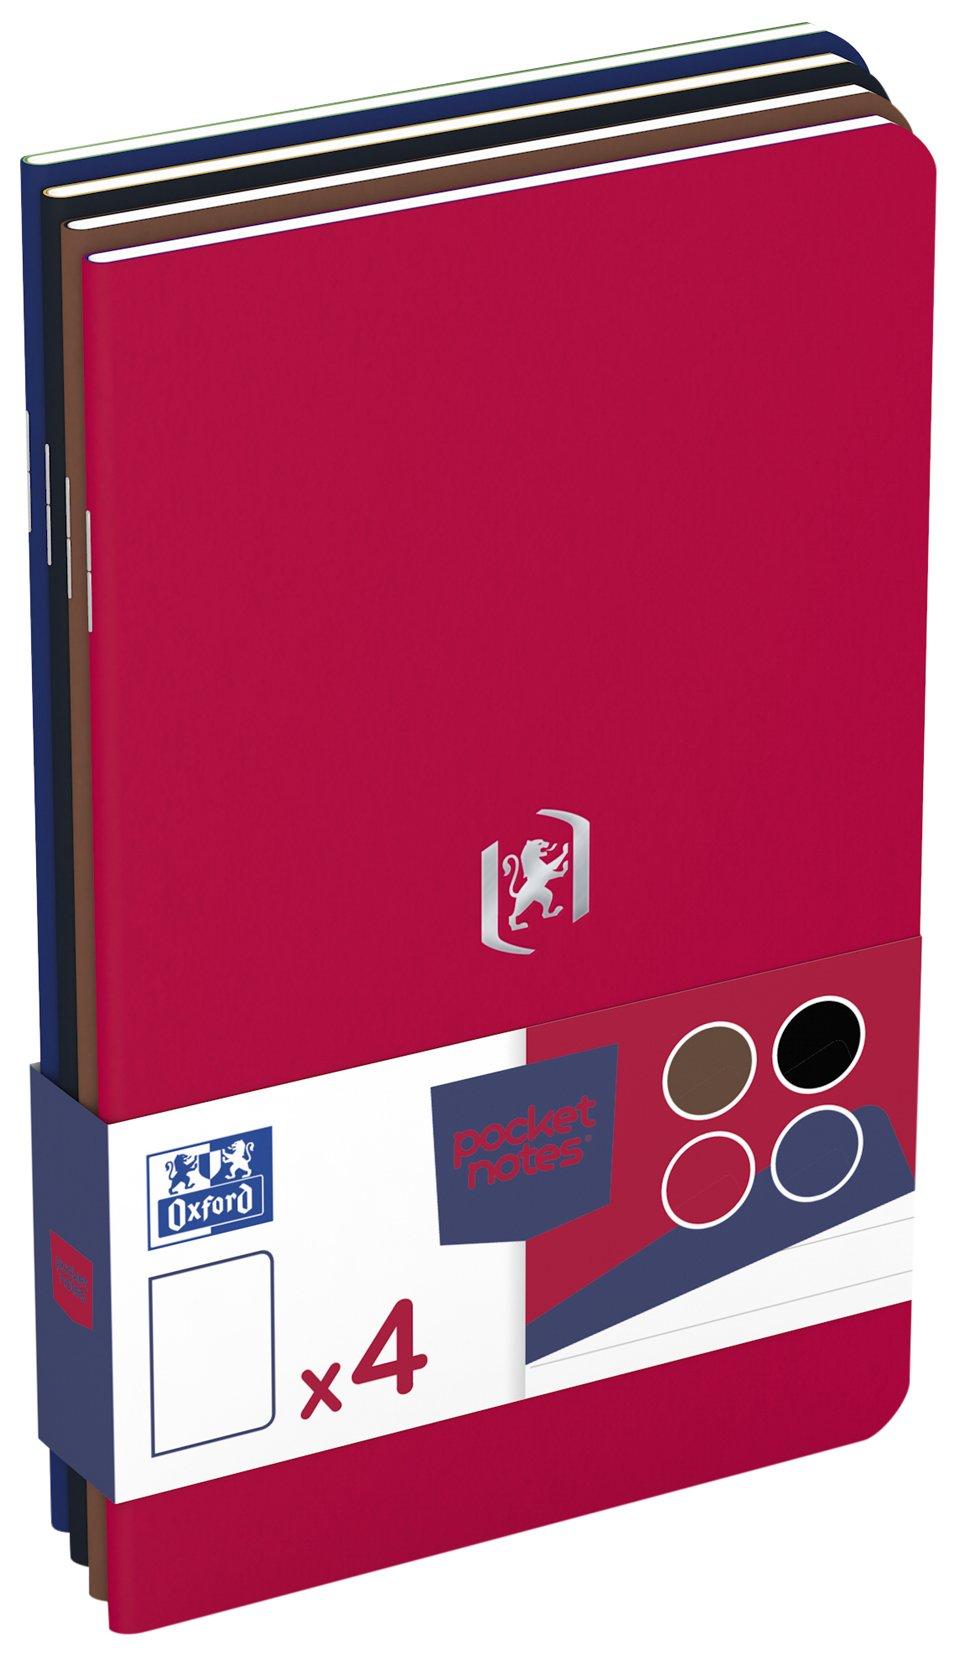 Oxford Notepad, Pocket Notes Pack of 4 4 Items Rot, Schwarz, Braun, Royalblau